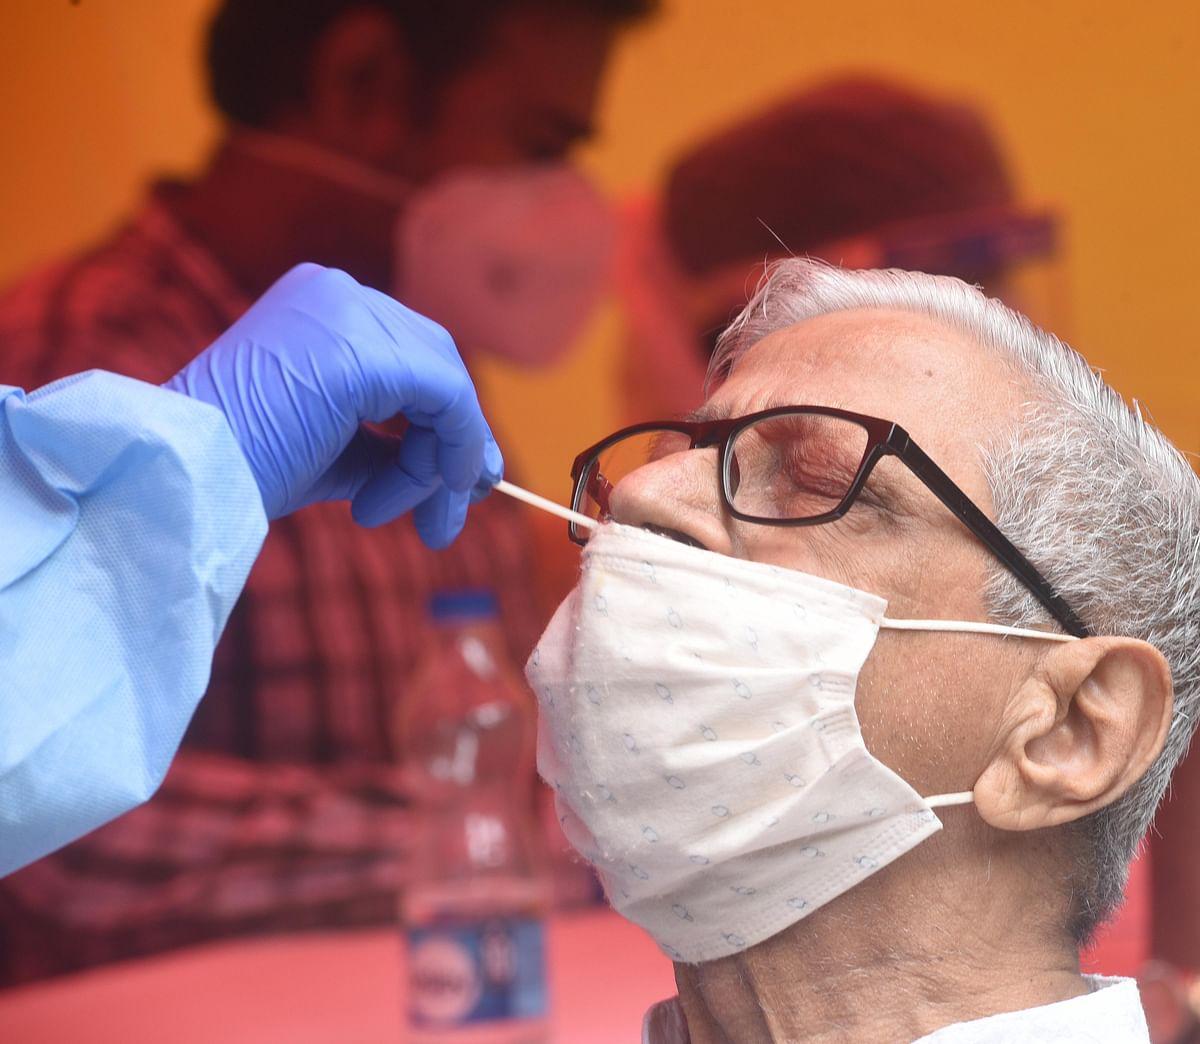 Coronavirus in Maharashtra: State reports 18,105 new COVID-19 cases, tally rises to 8,43,844